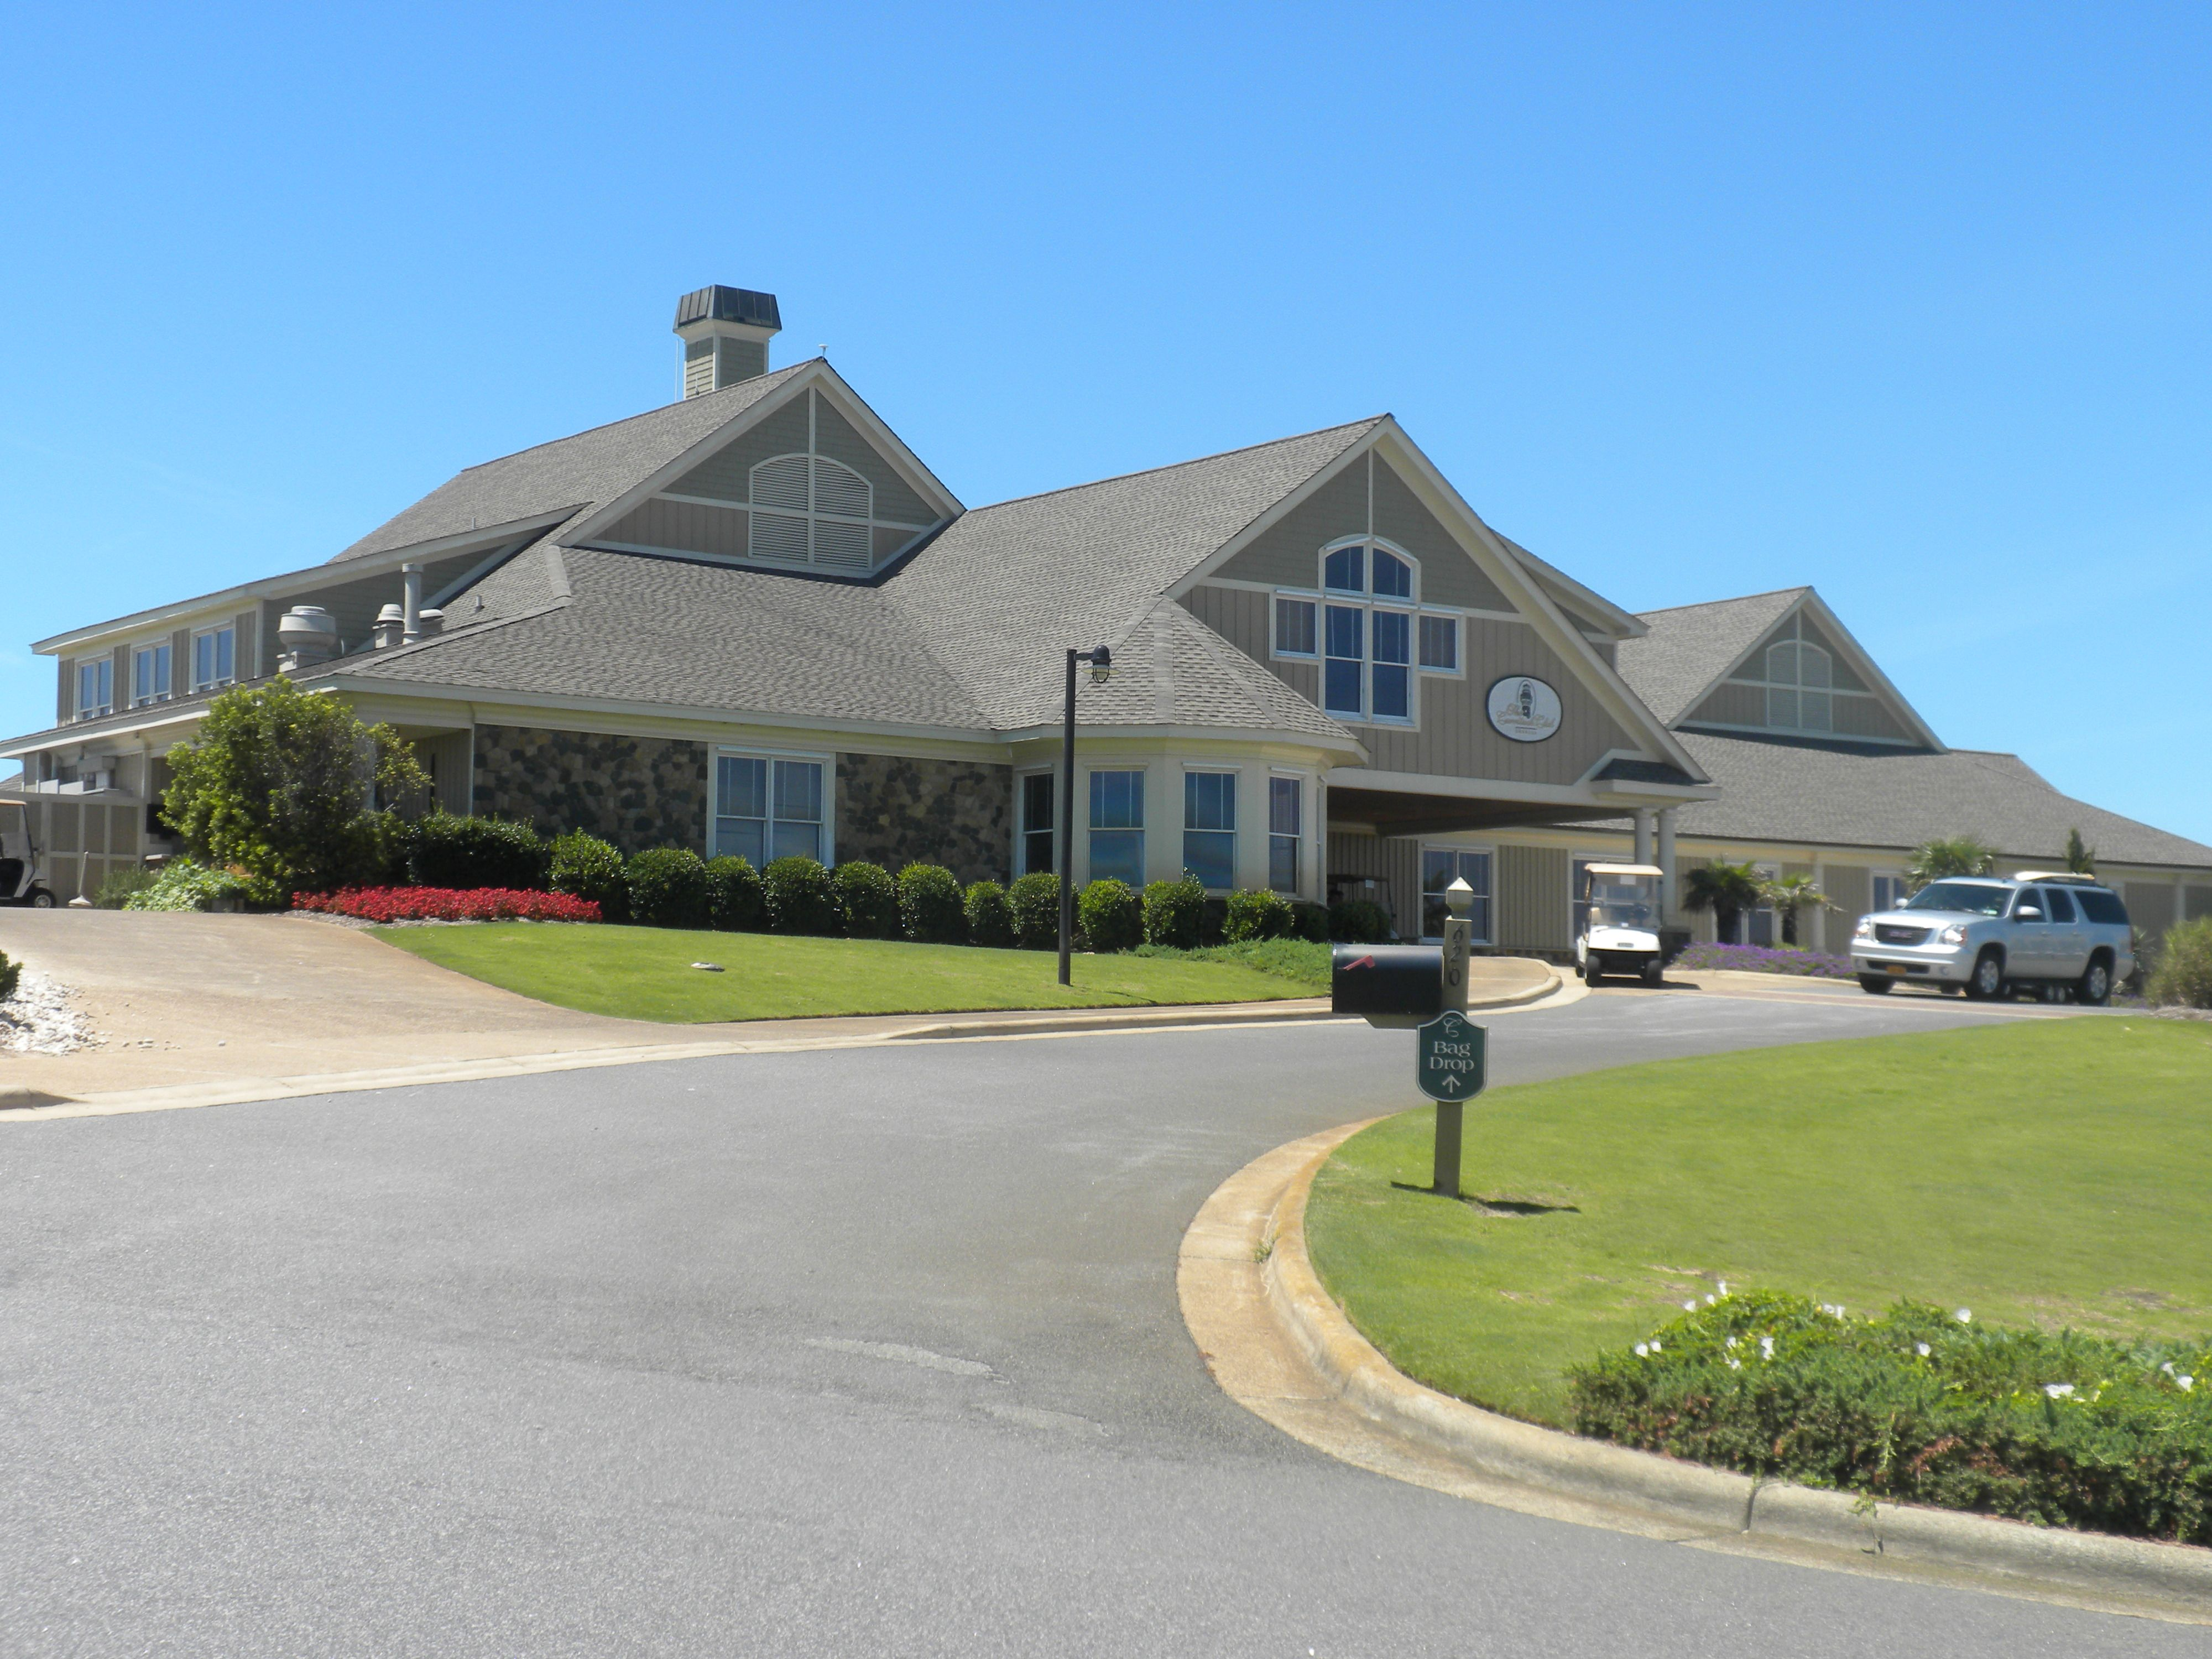 Currituck Club clubhouse, Corolla NC